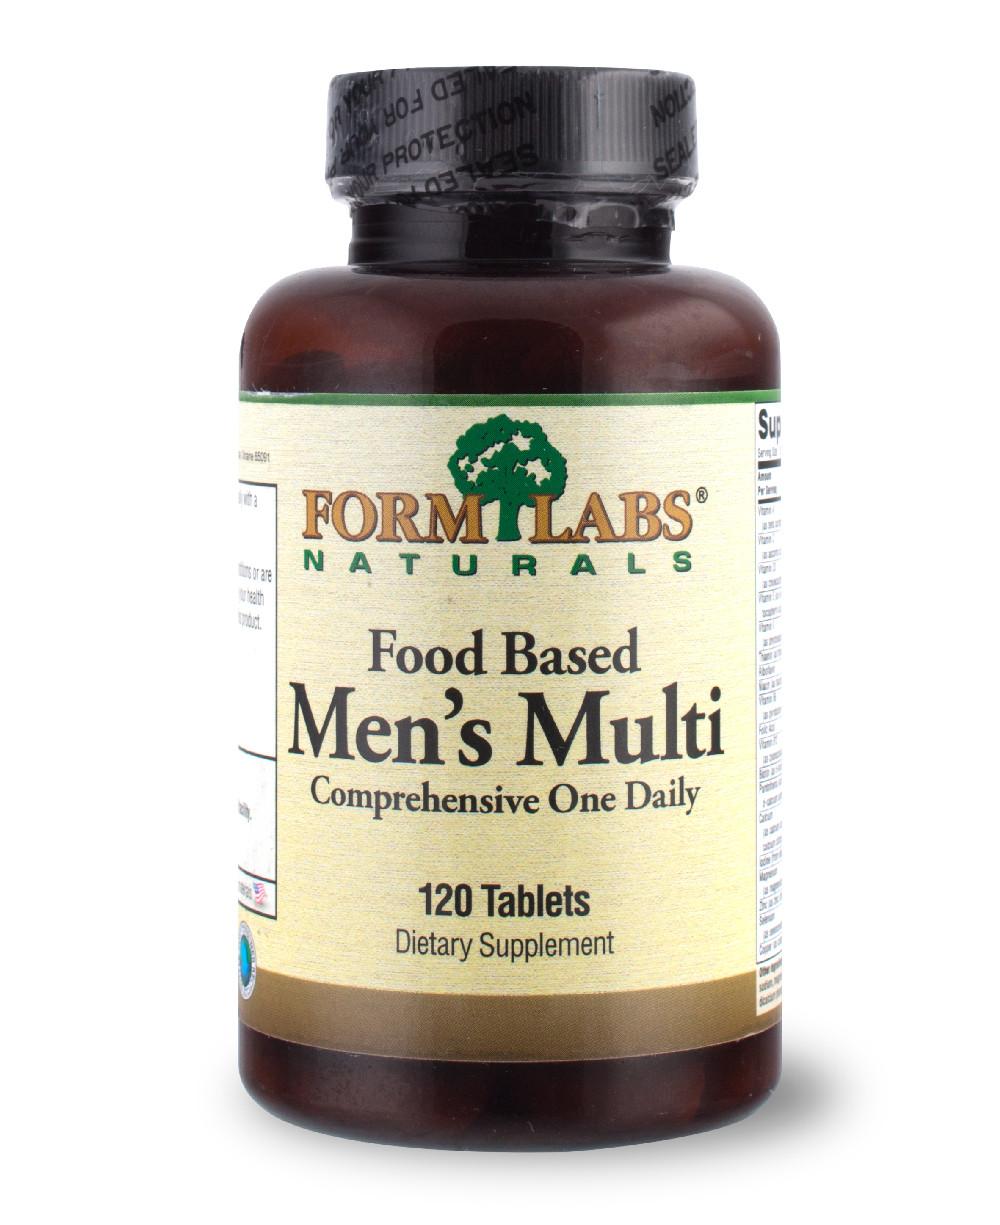 FLN Food Based Men's Multi 120 tab